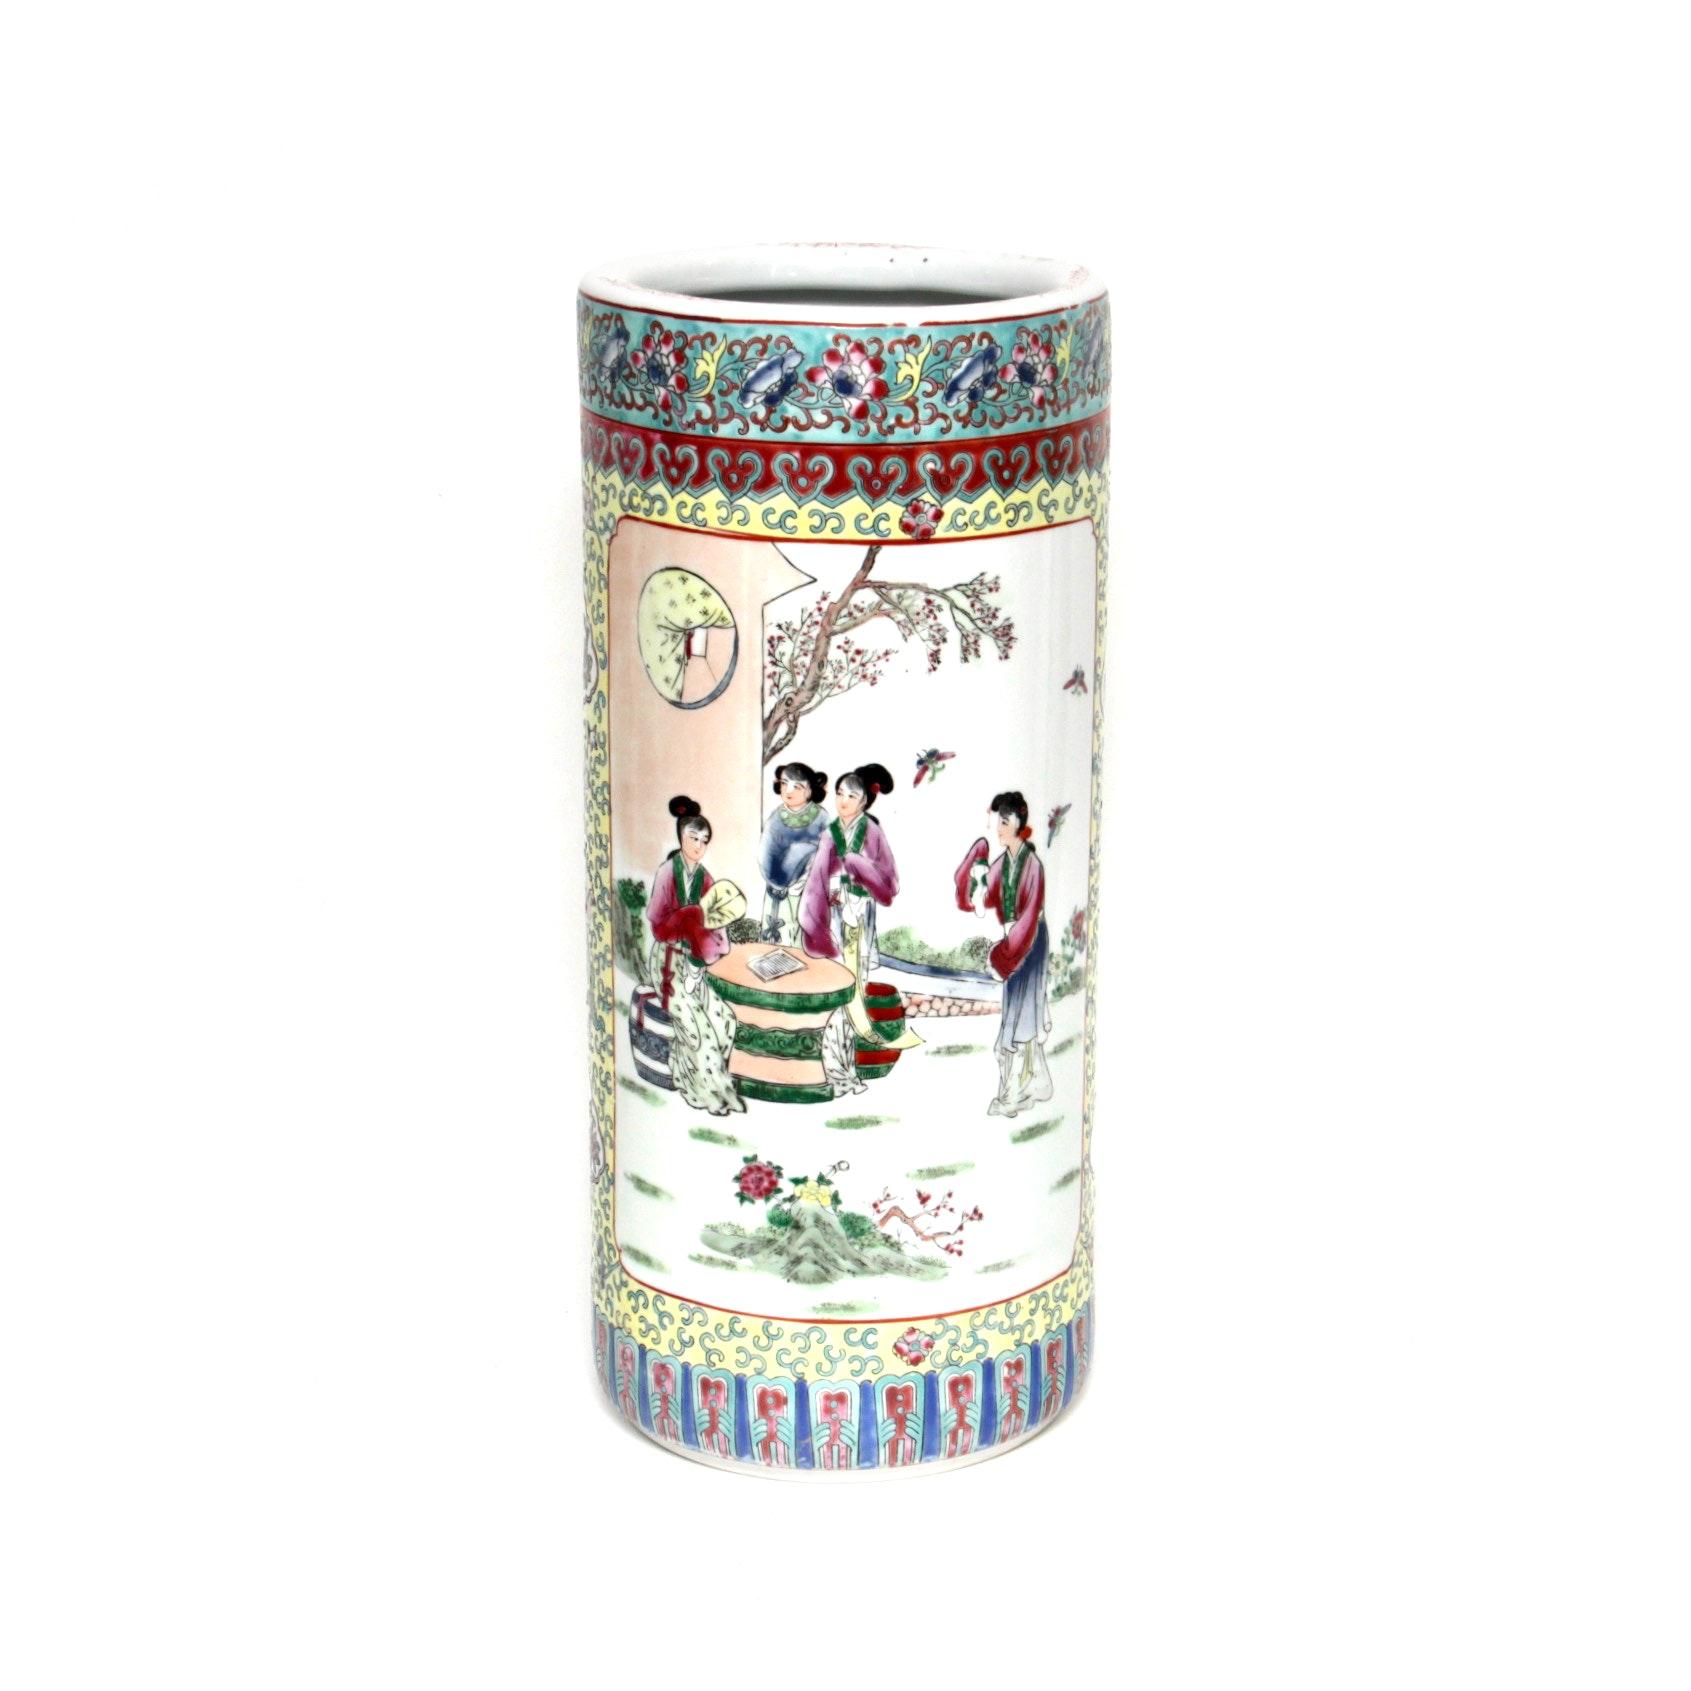 Chinese Ceramic Umbrella Stand